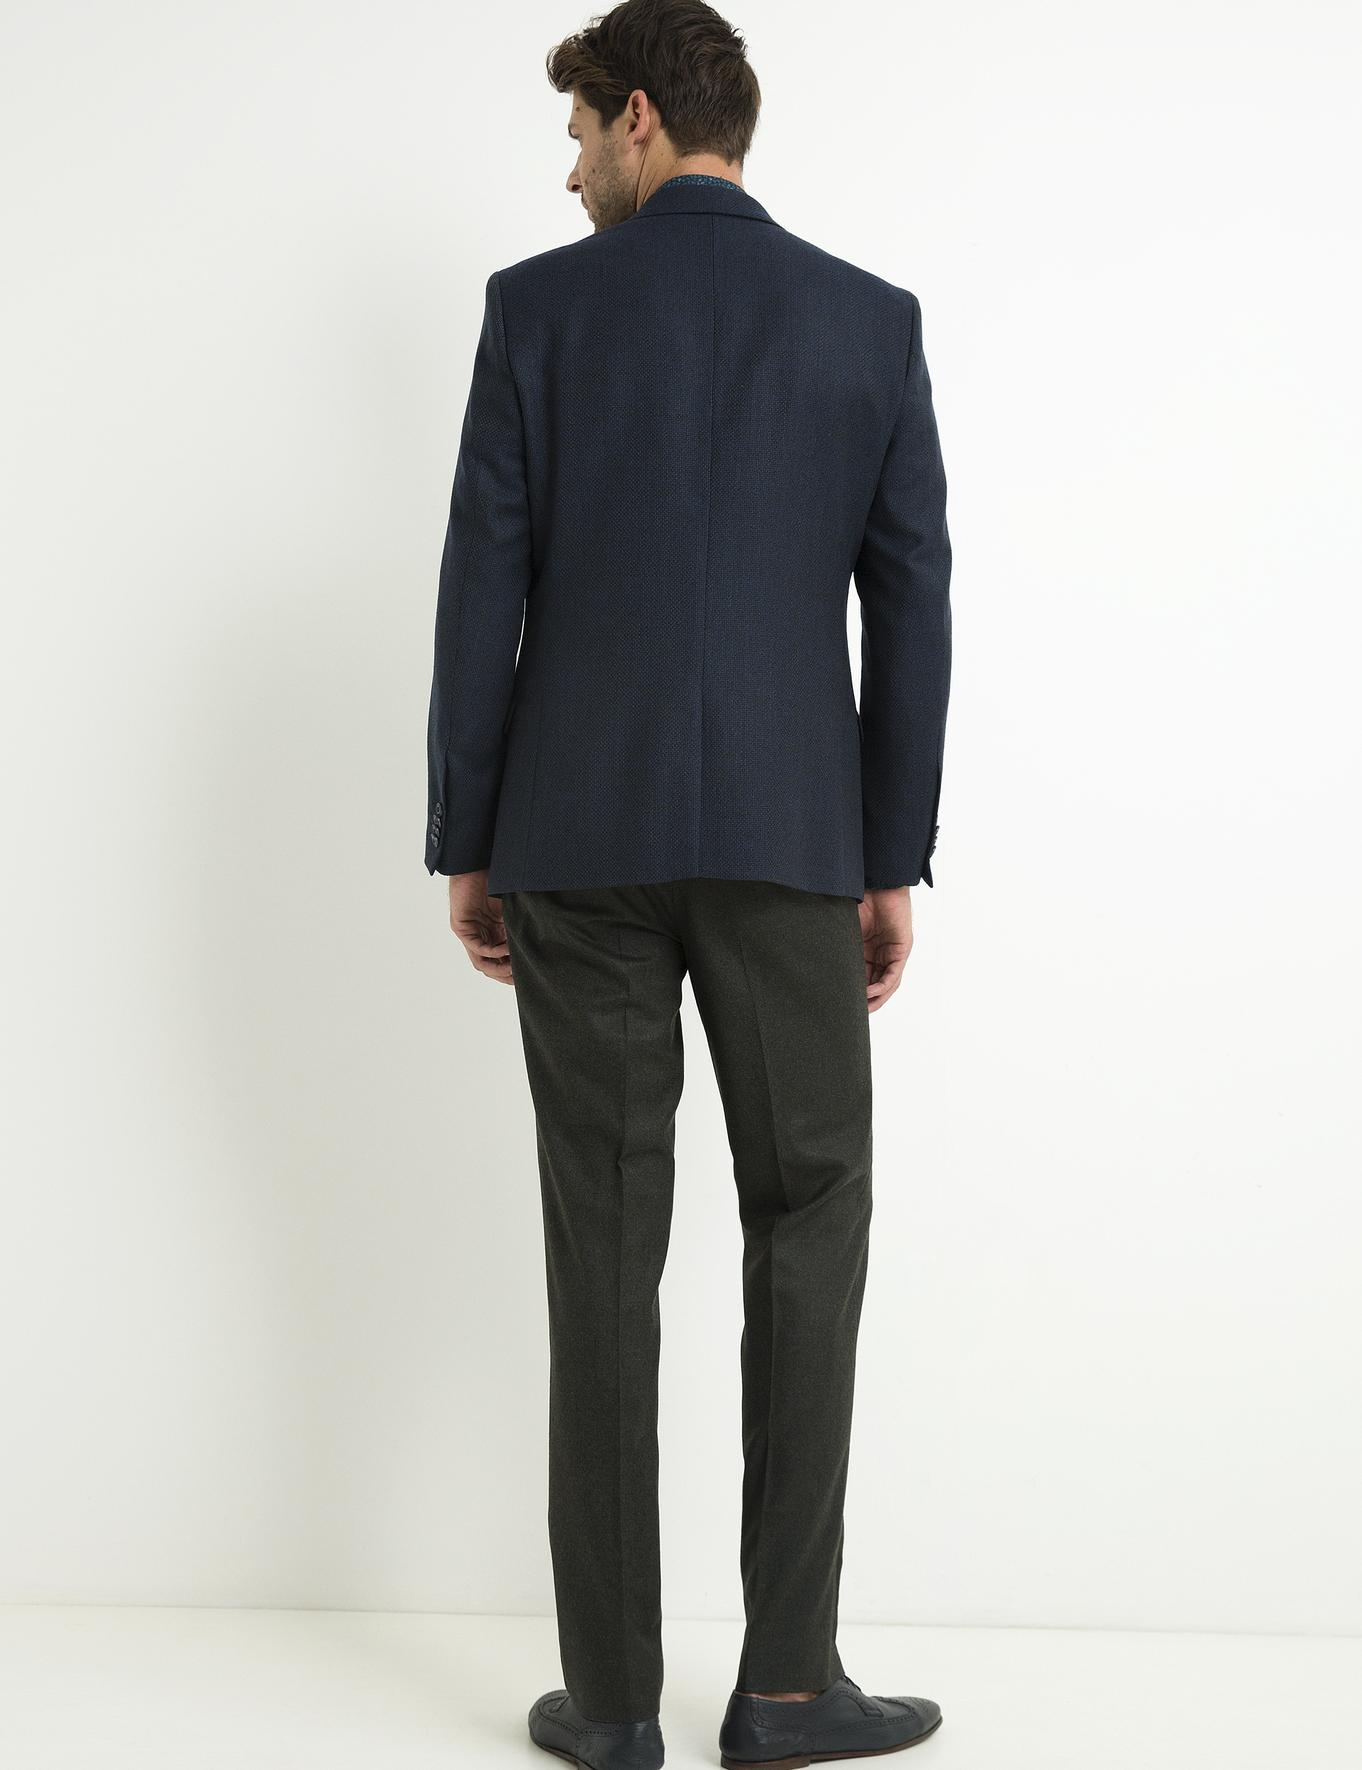 Yeşil Slim Fit Pantolon - 50192637193